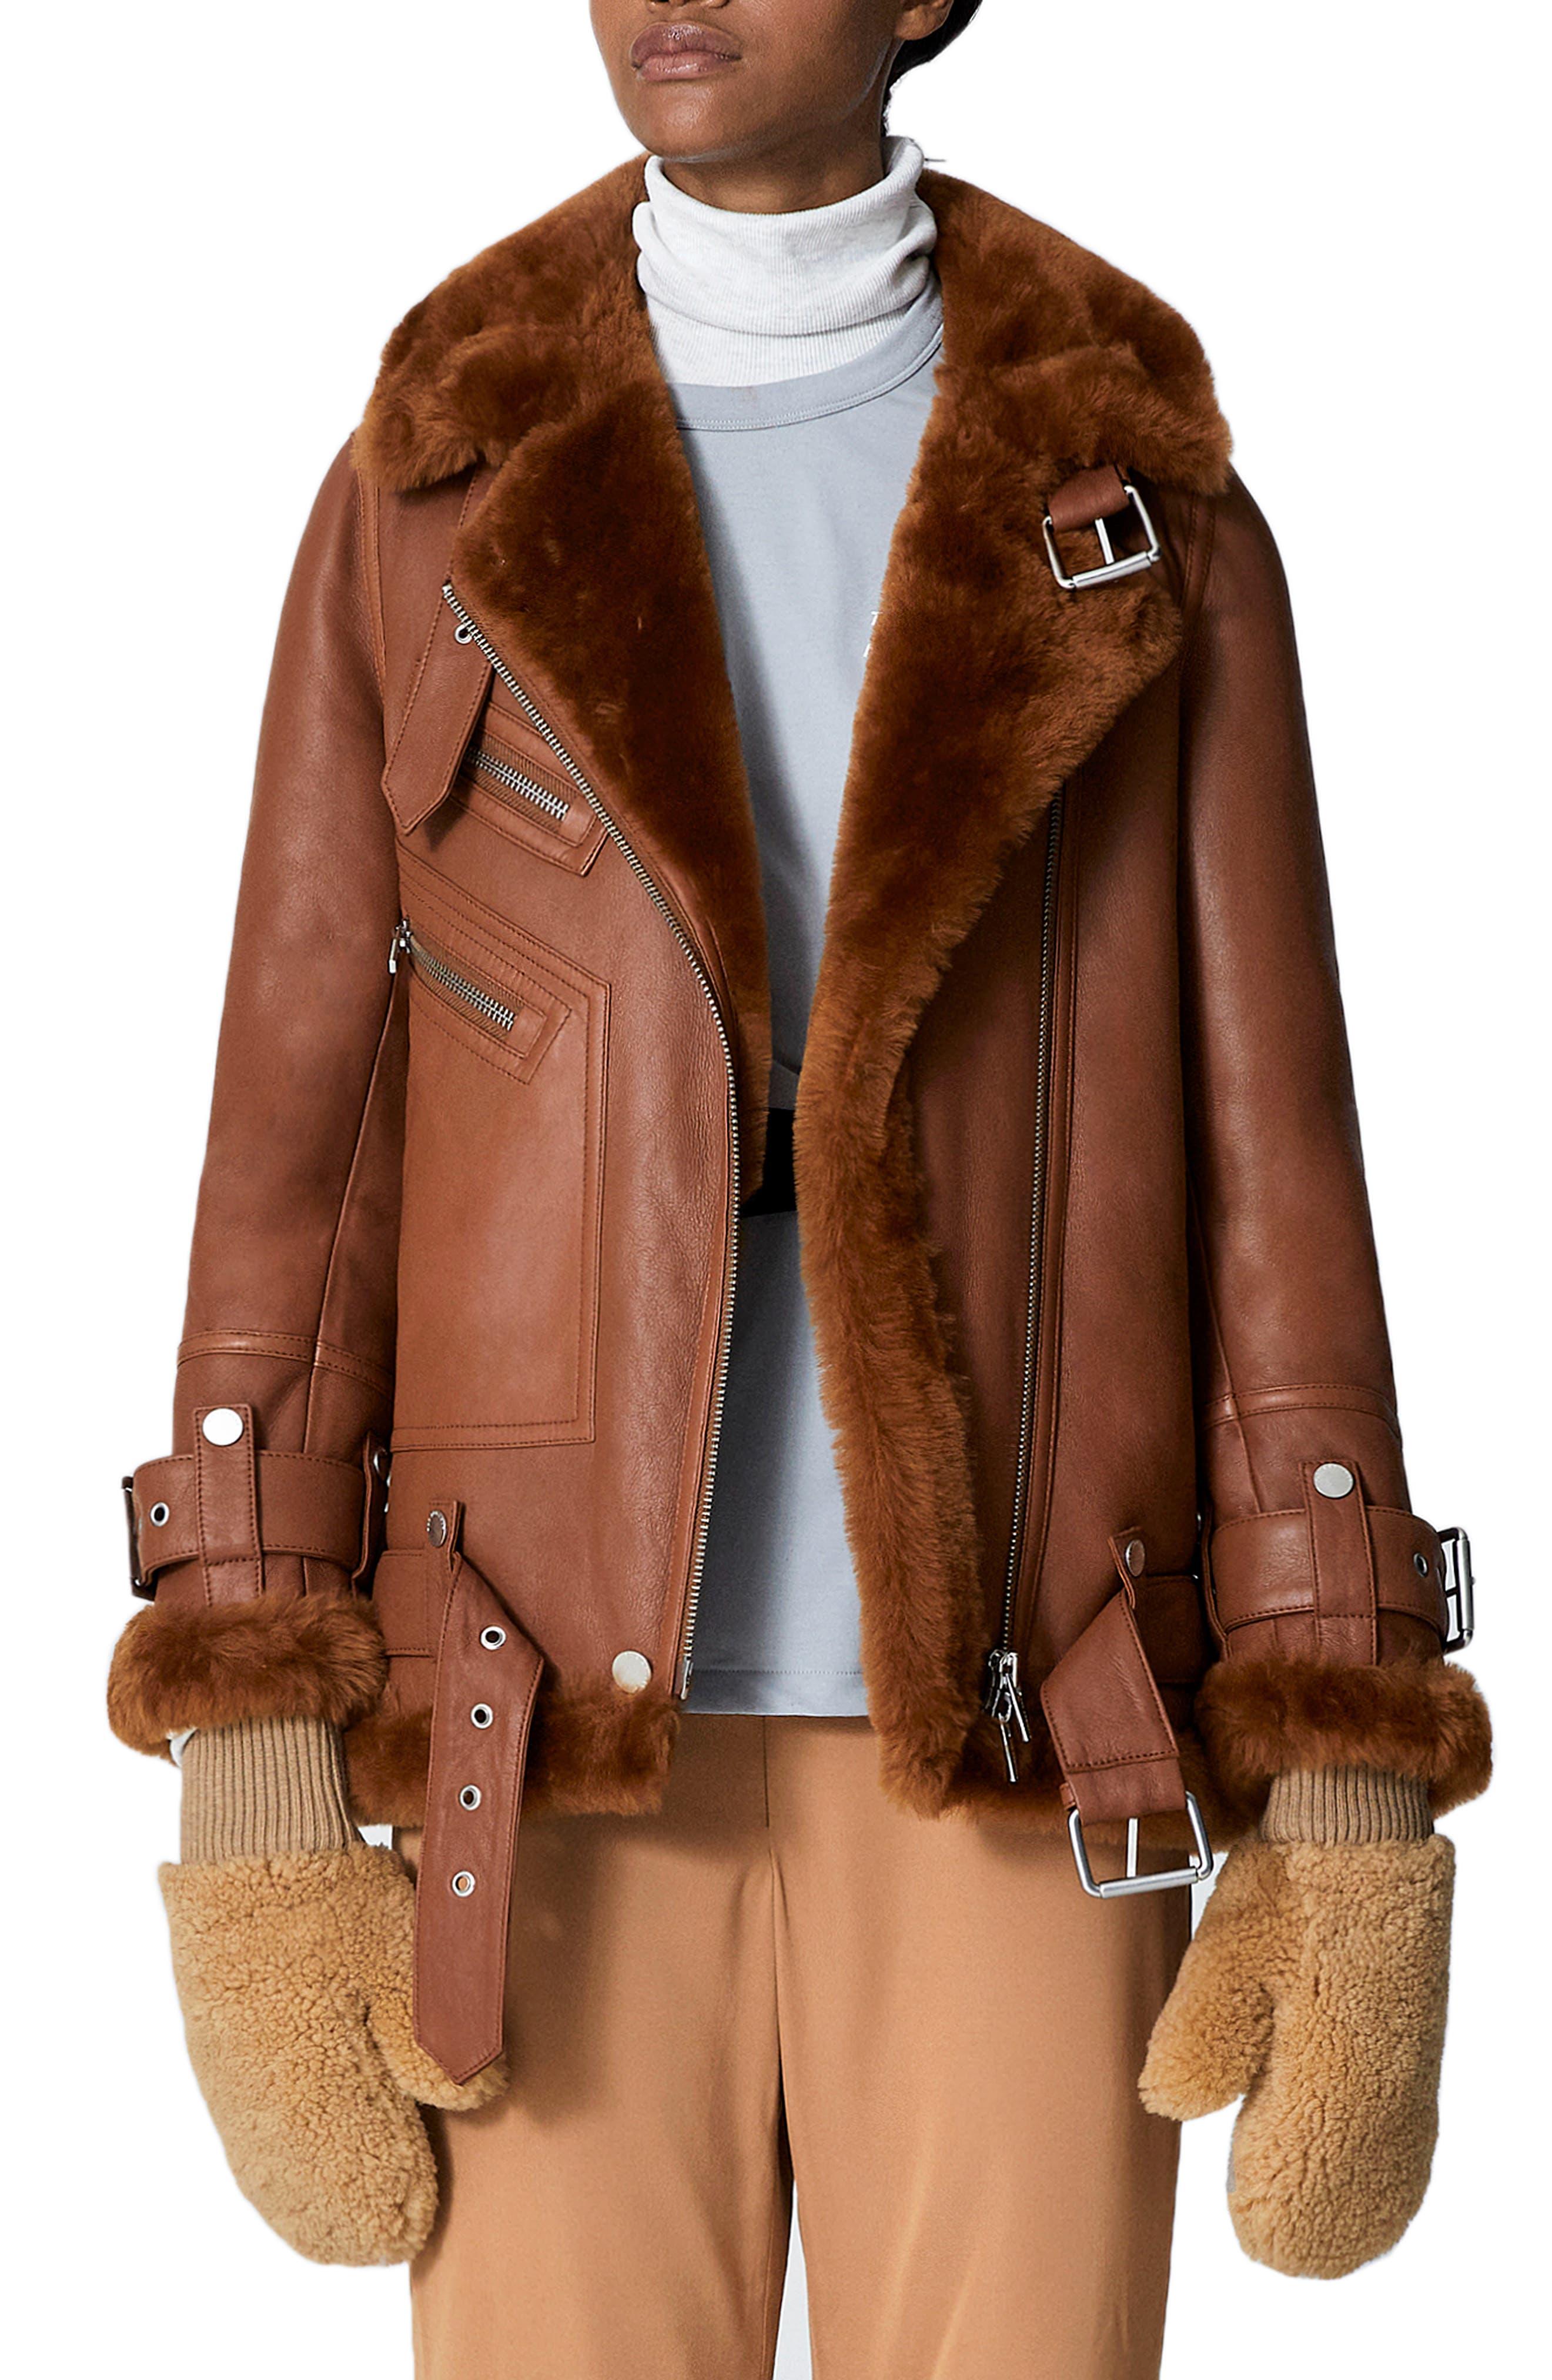 THE ARRIVALS Moya Iii Oversize Leather & Genuine Shearling Jacket in Terra